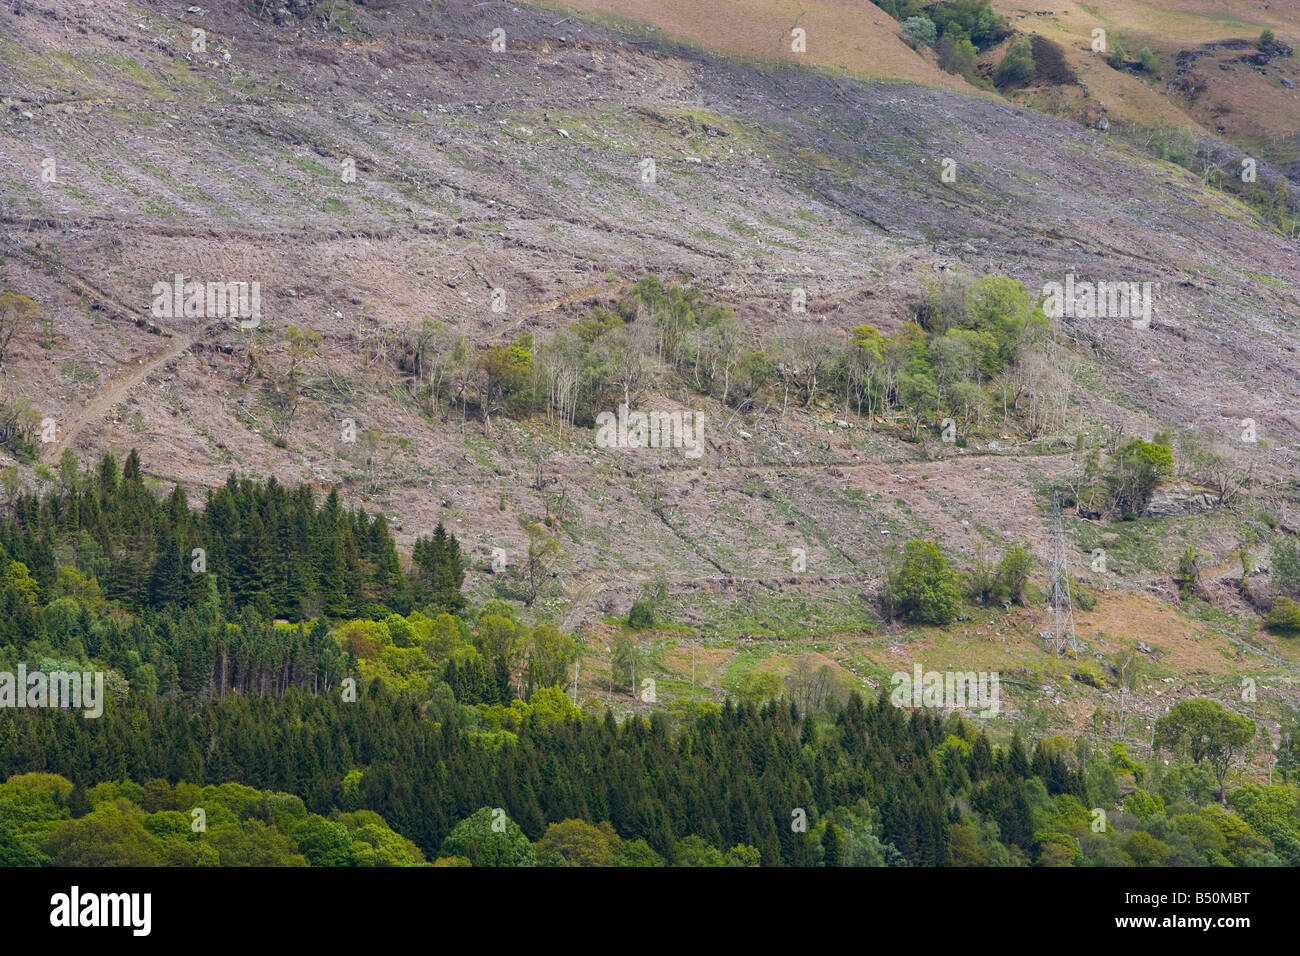 conifer plantation. and bare hillside after timber felling - Stock Image